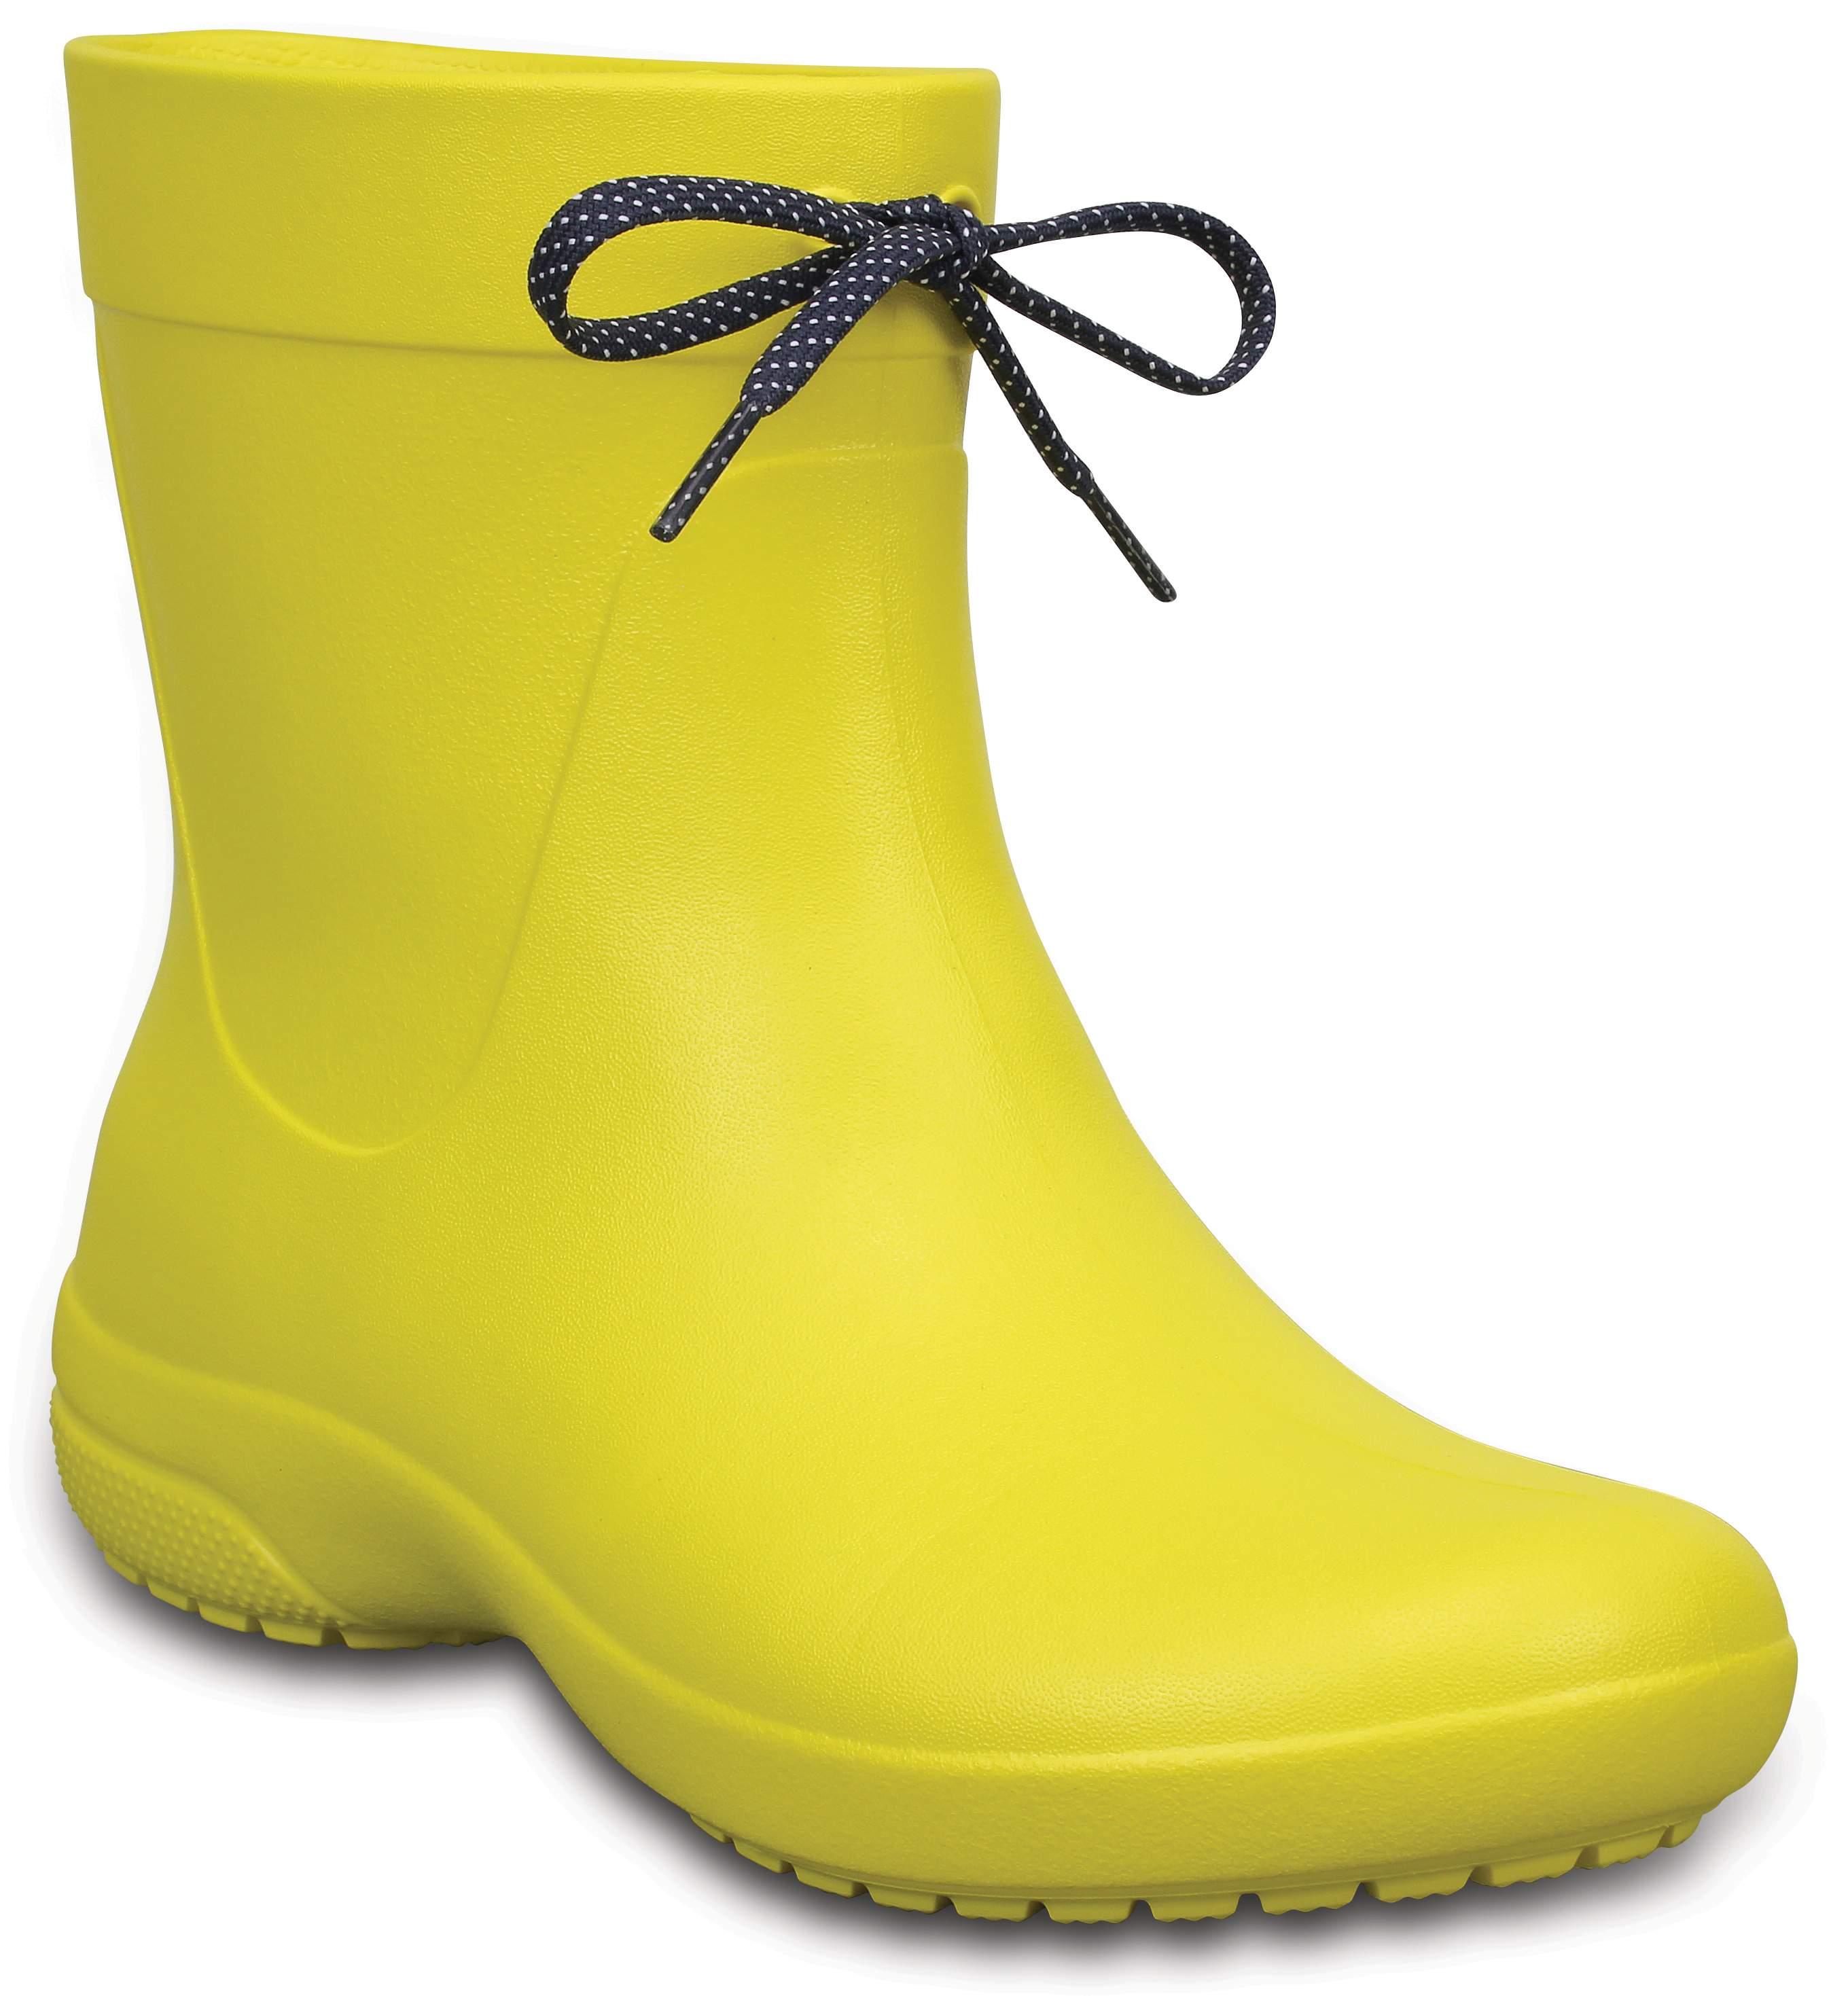 Freesail Shorty Waterproof Comfortable Rain Boots Crocs